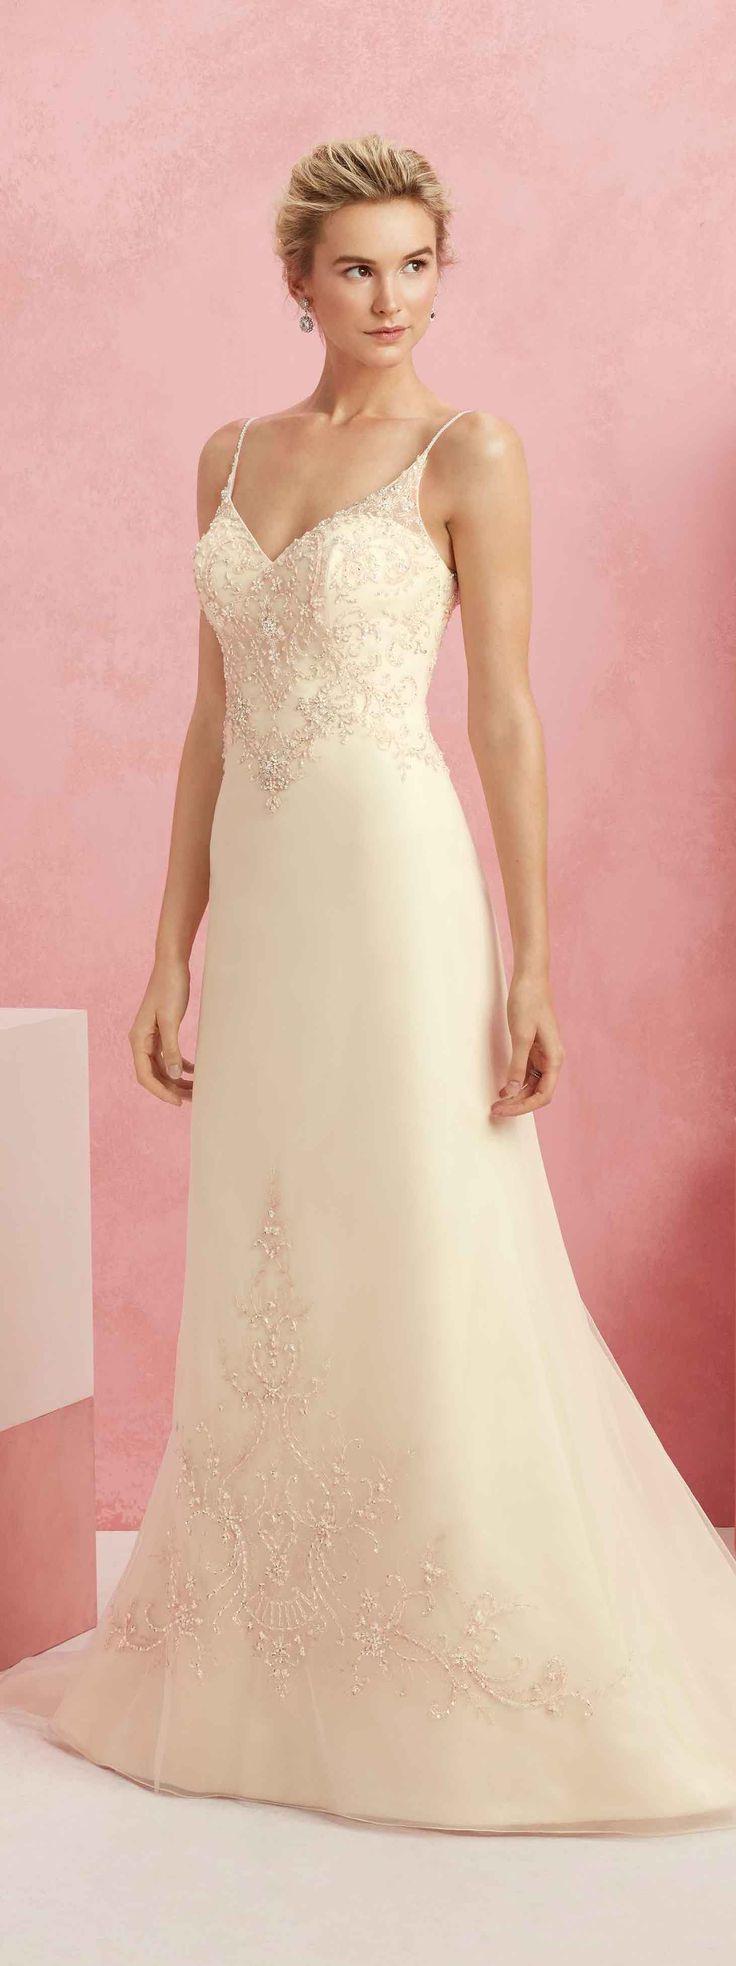 Mejores 82 imágenes de dresses en Pinterest | Vestidos de novia ...